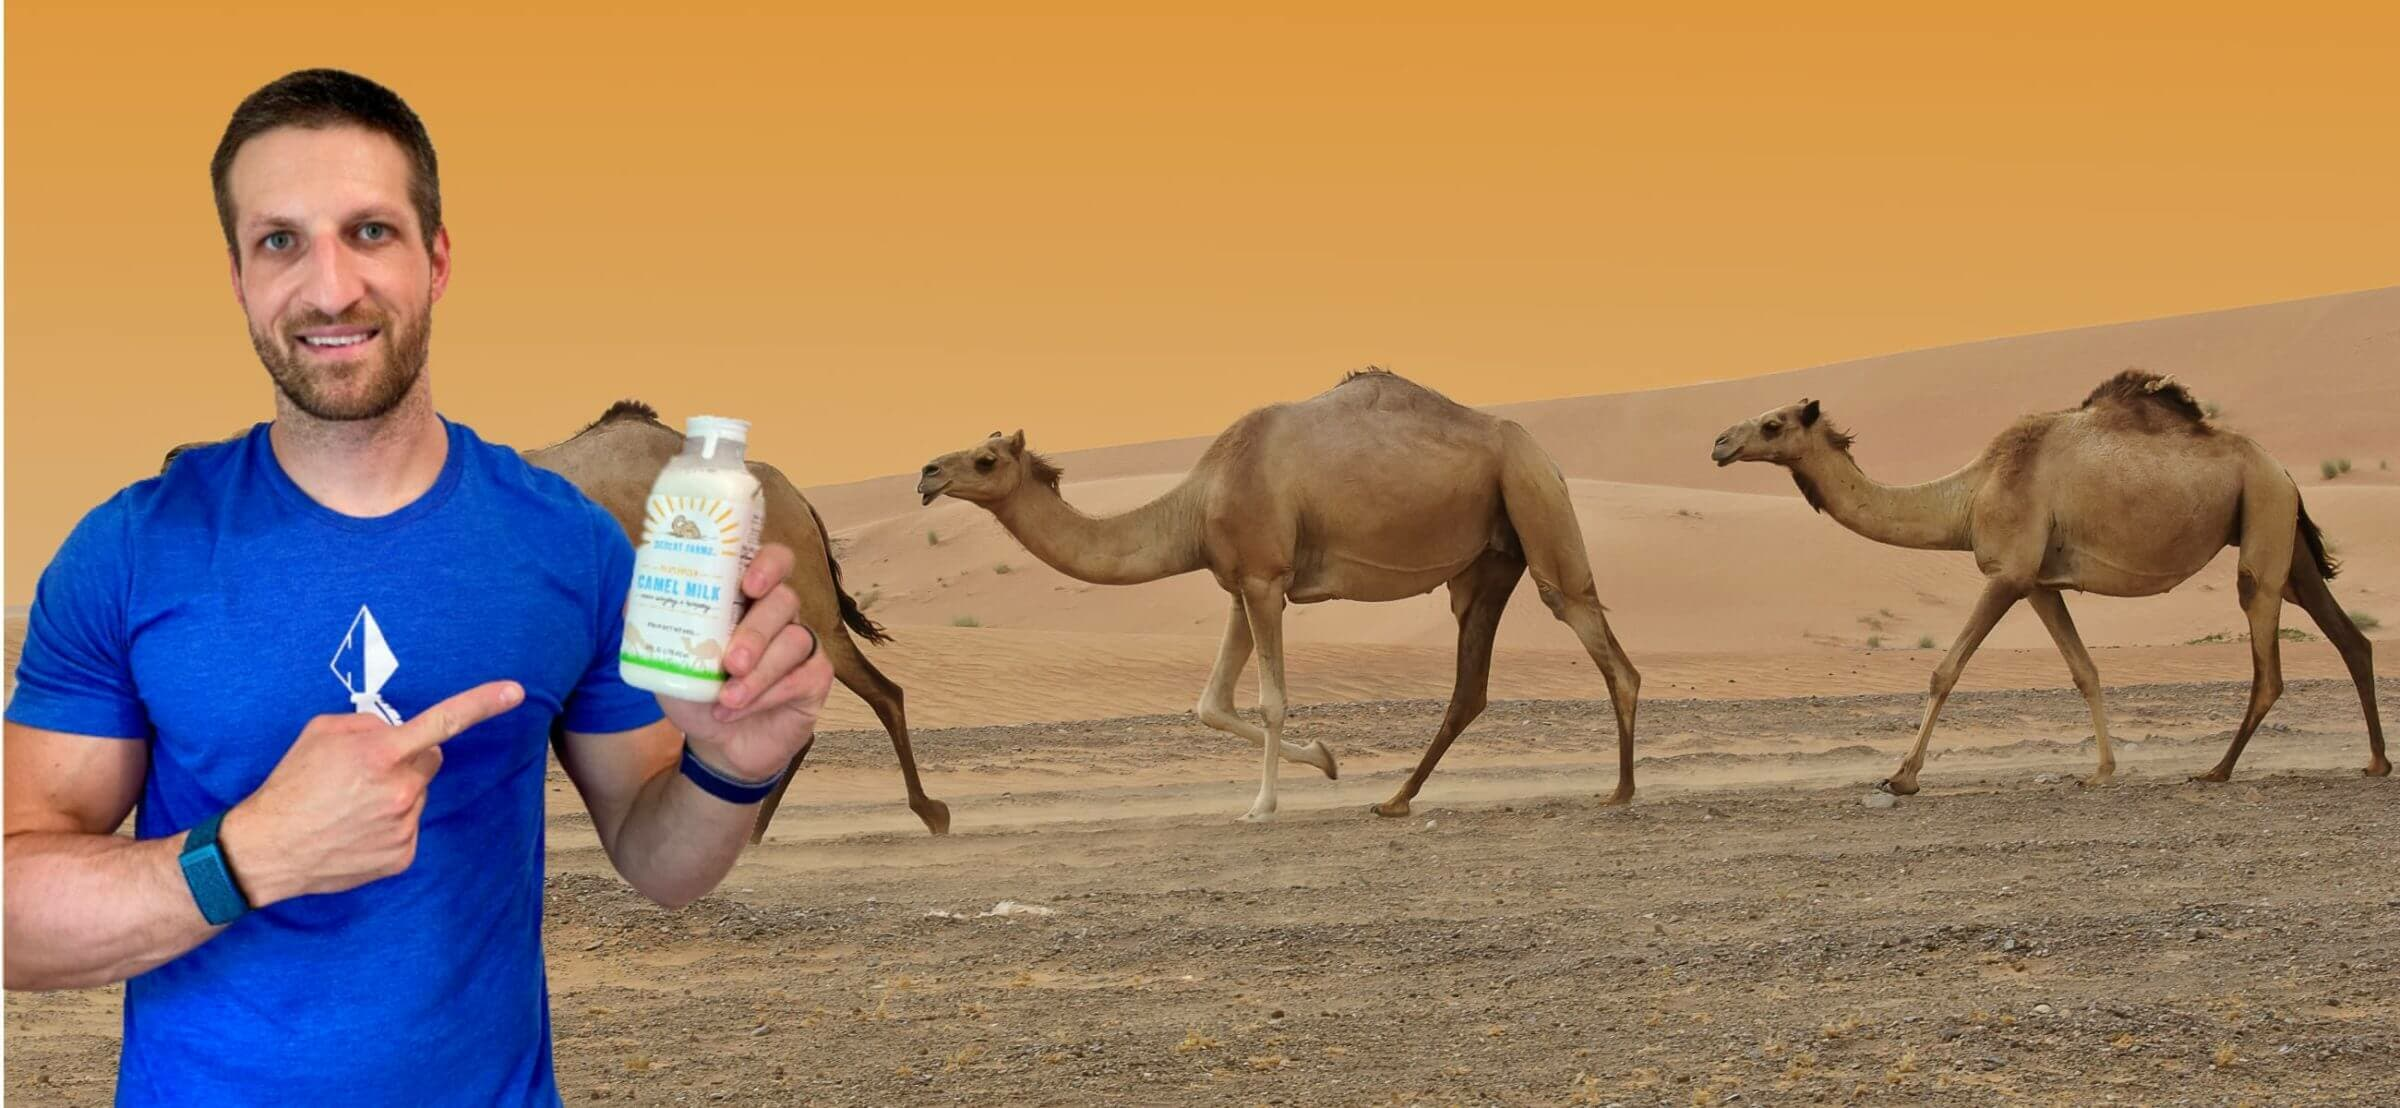 Is camel milk healthier than cow milk